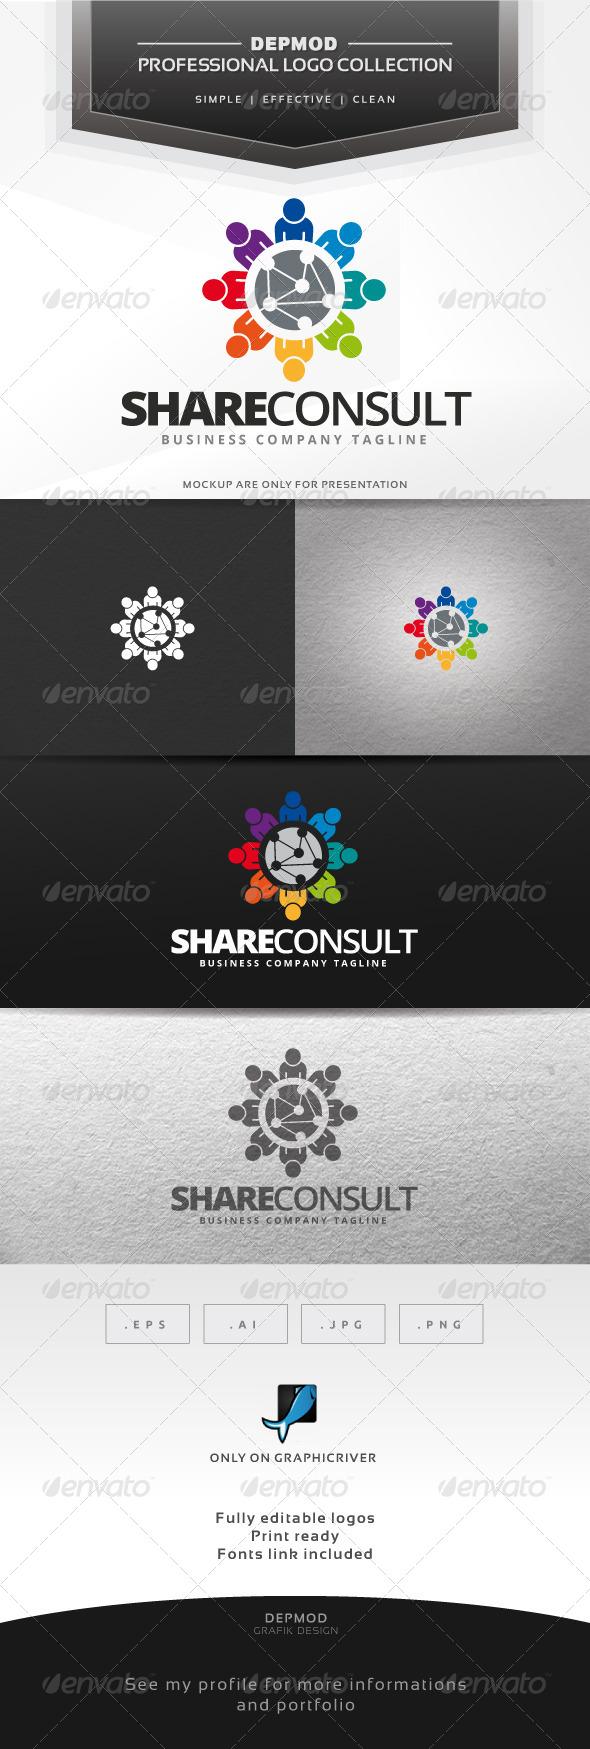 GraphicRiver Share Consult Logo 6967842